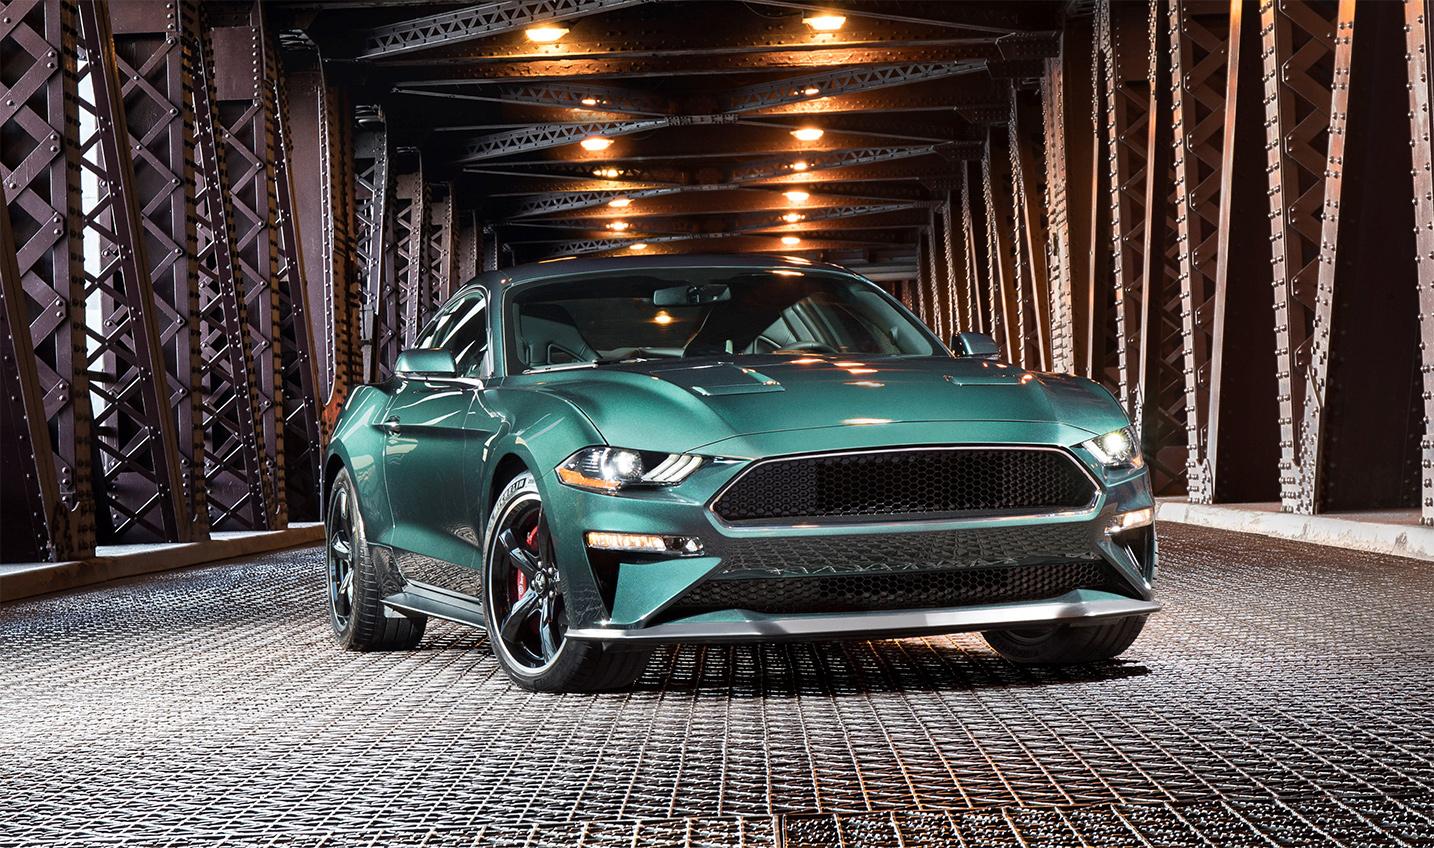 TrackWorthy - 2019 Ford Mustang Bullitt